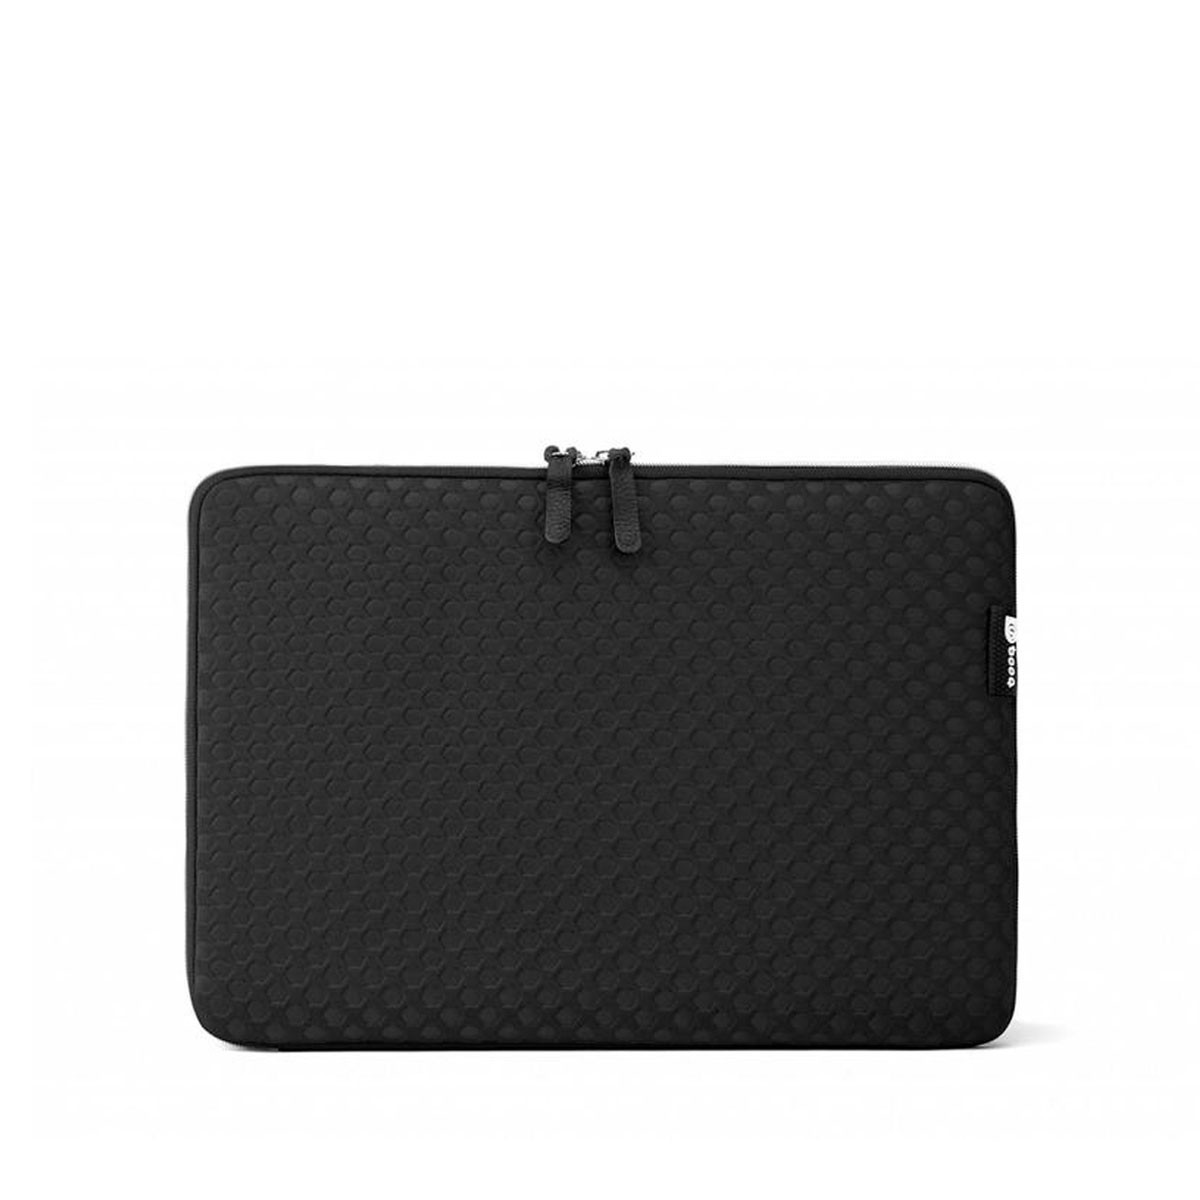 "Booq Taipan 15T, neoprenové pouzdro pro MacBook Pro 15"" 2016 - černé"